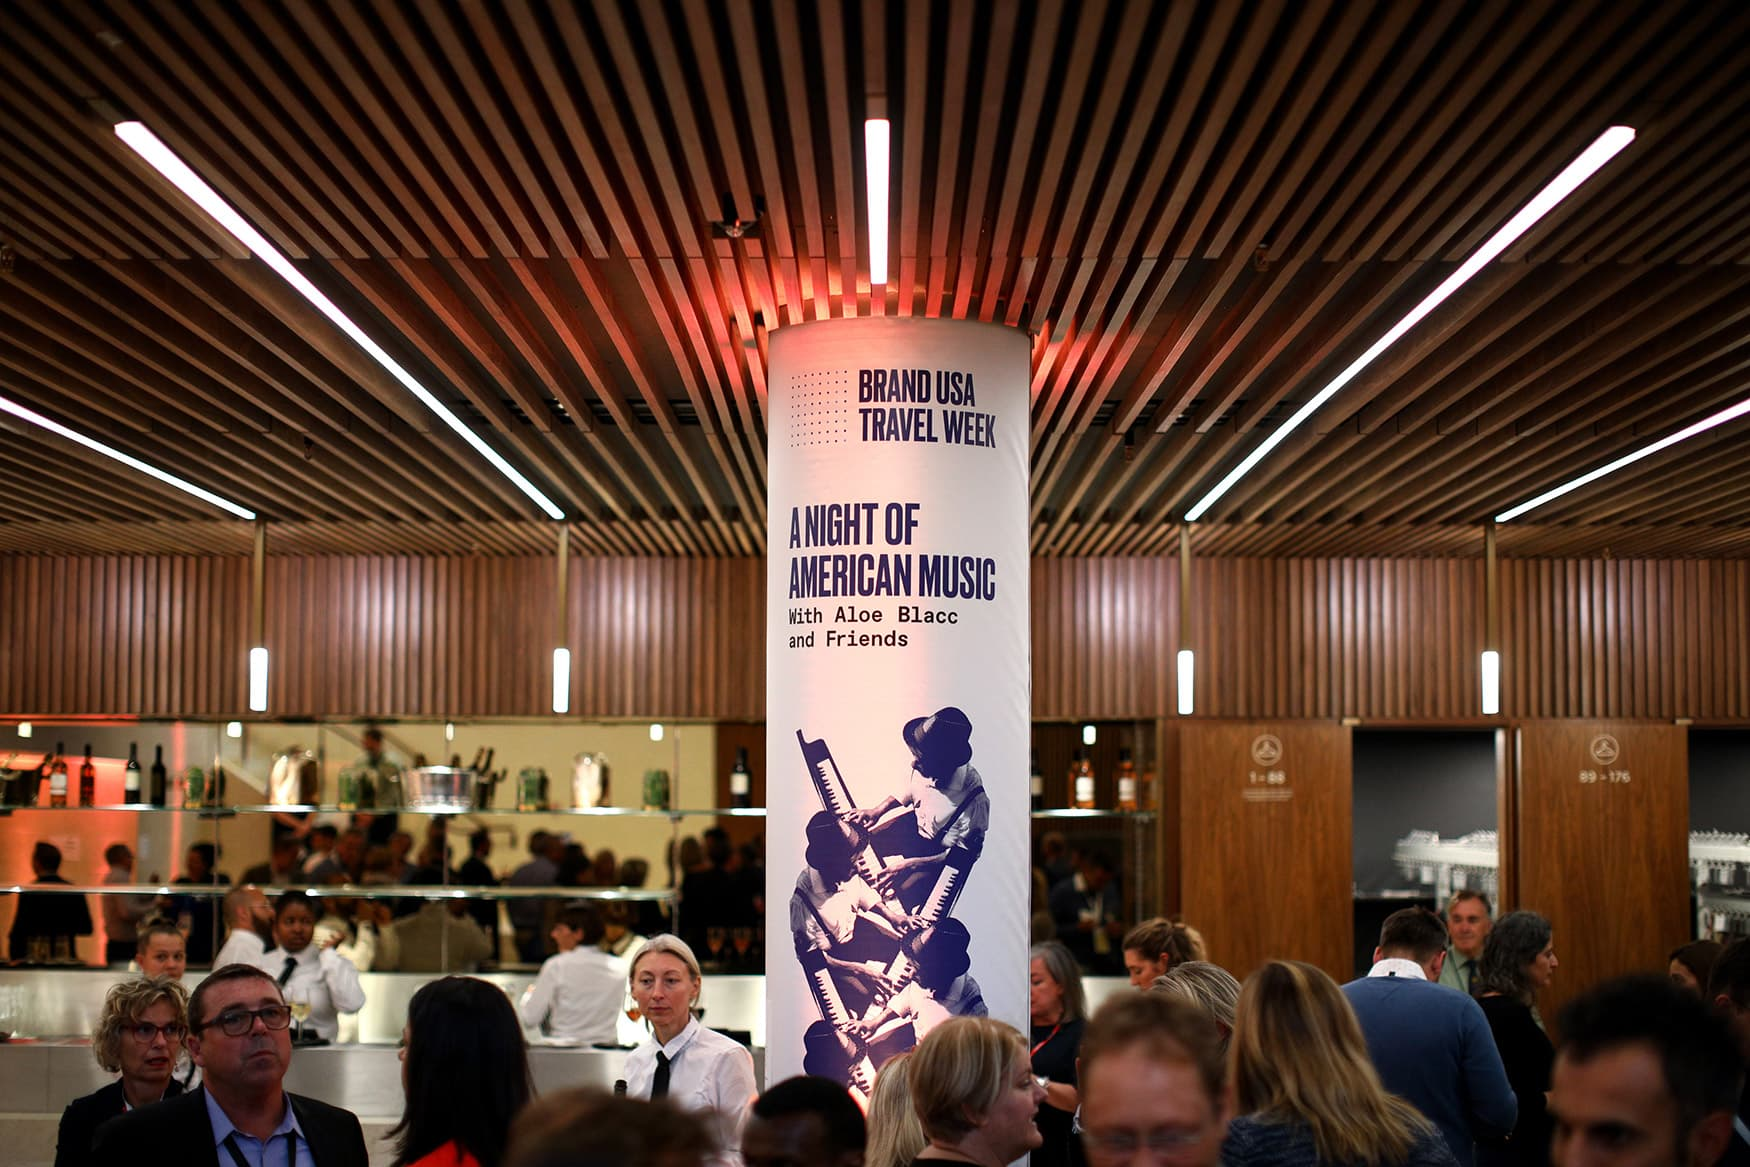 Brand-USA-Travel_Week-Opera-Hall-3-Citizen